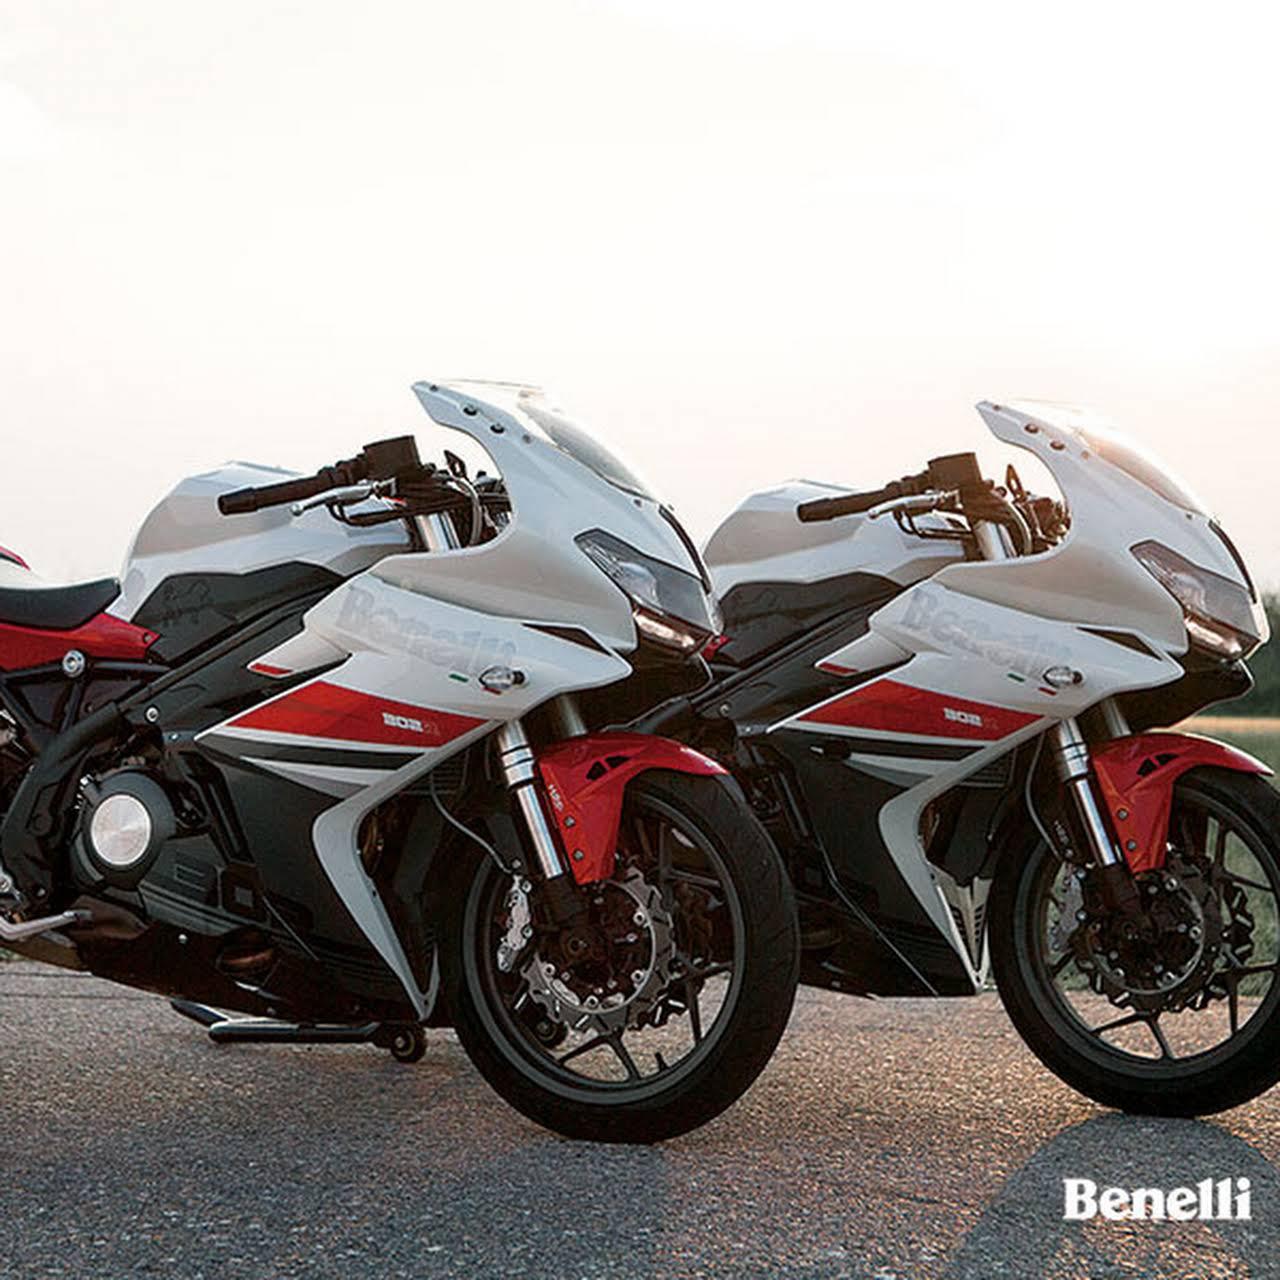 Yamaha Capital Motors - Your #1 Derbi, Benelli, Vespa, Moto Guzzi